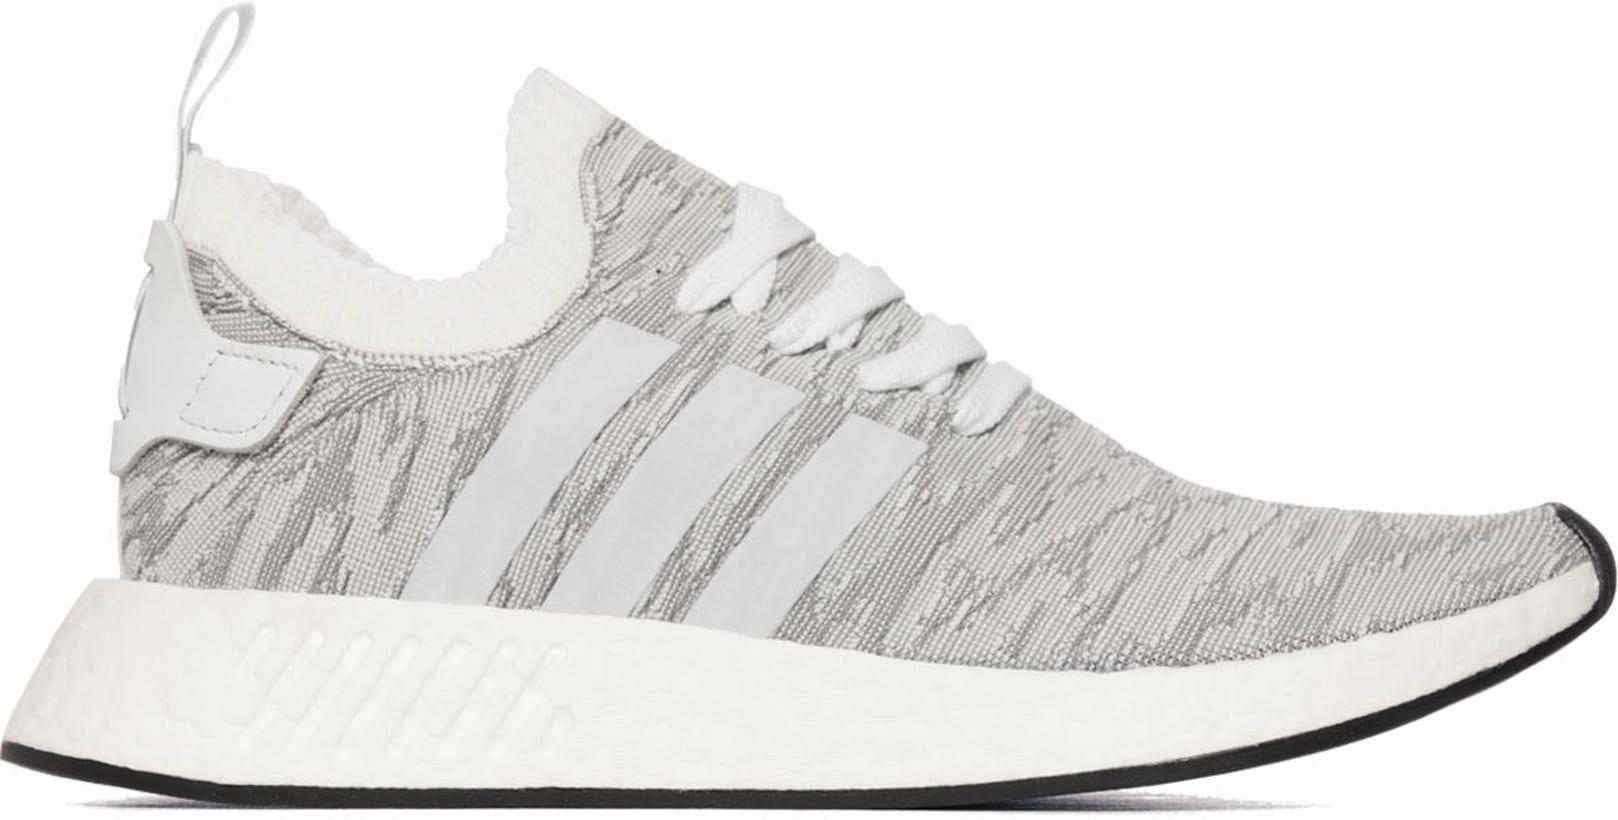 huge selection of 3dae9 80776 adidas Originals - NMD R2 Primeknit - Grey/Footwear White/Core Black/Future  Harvest